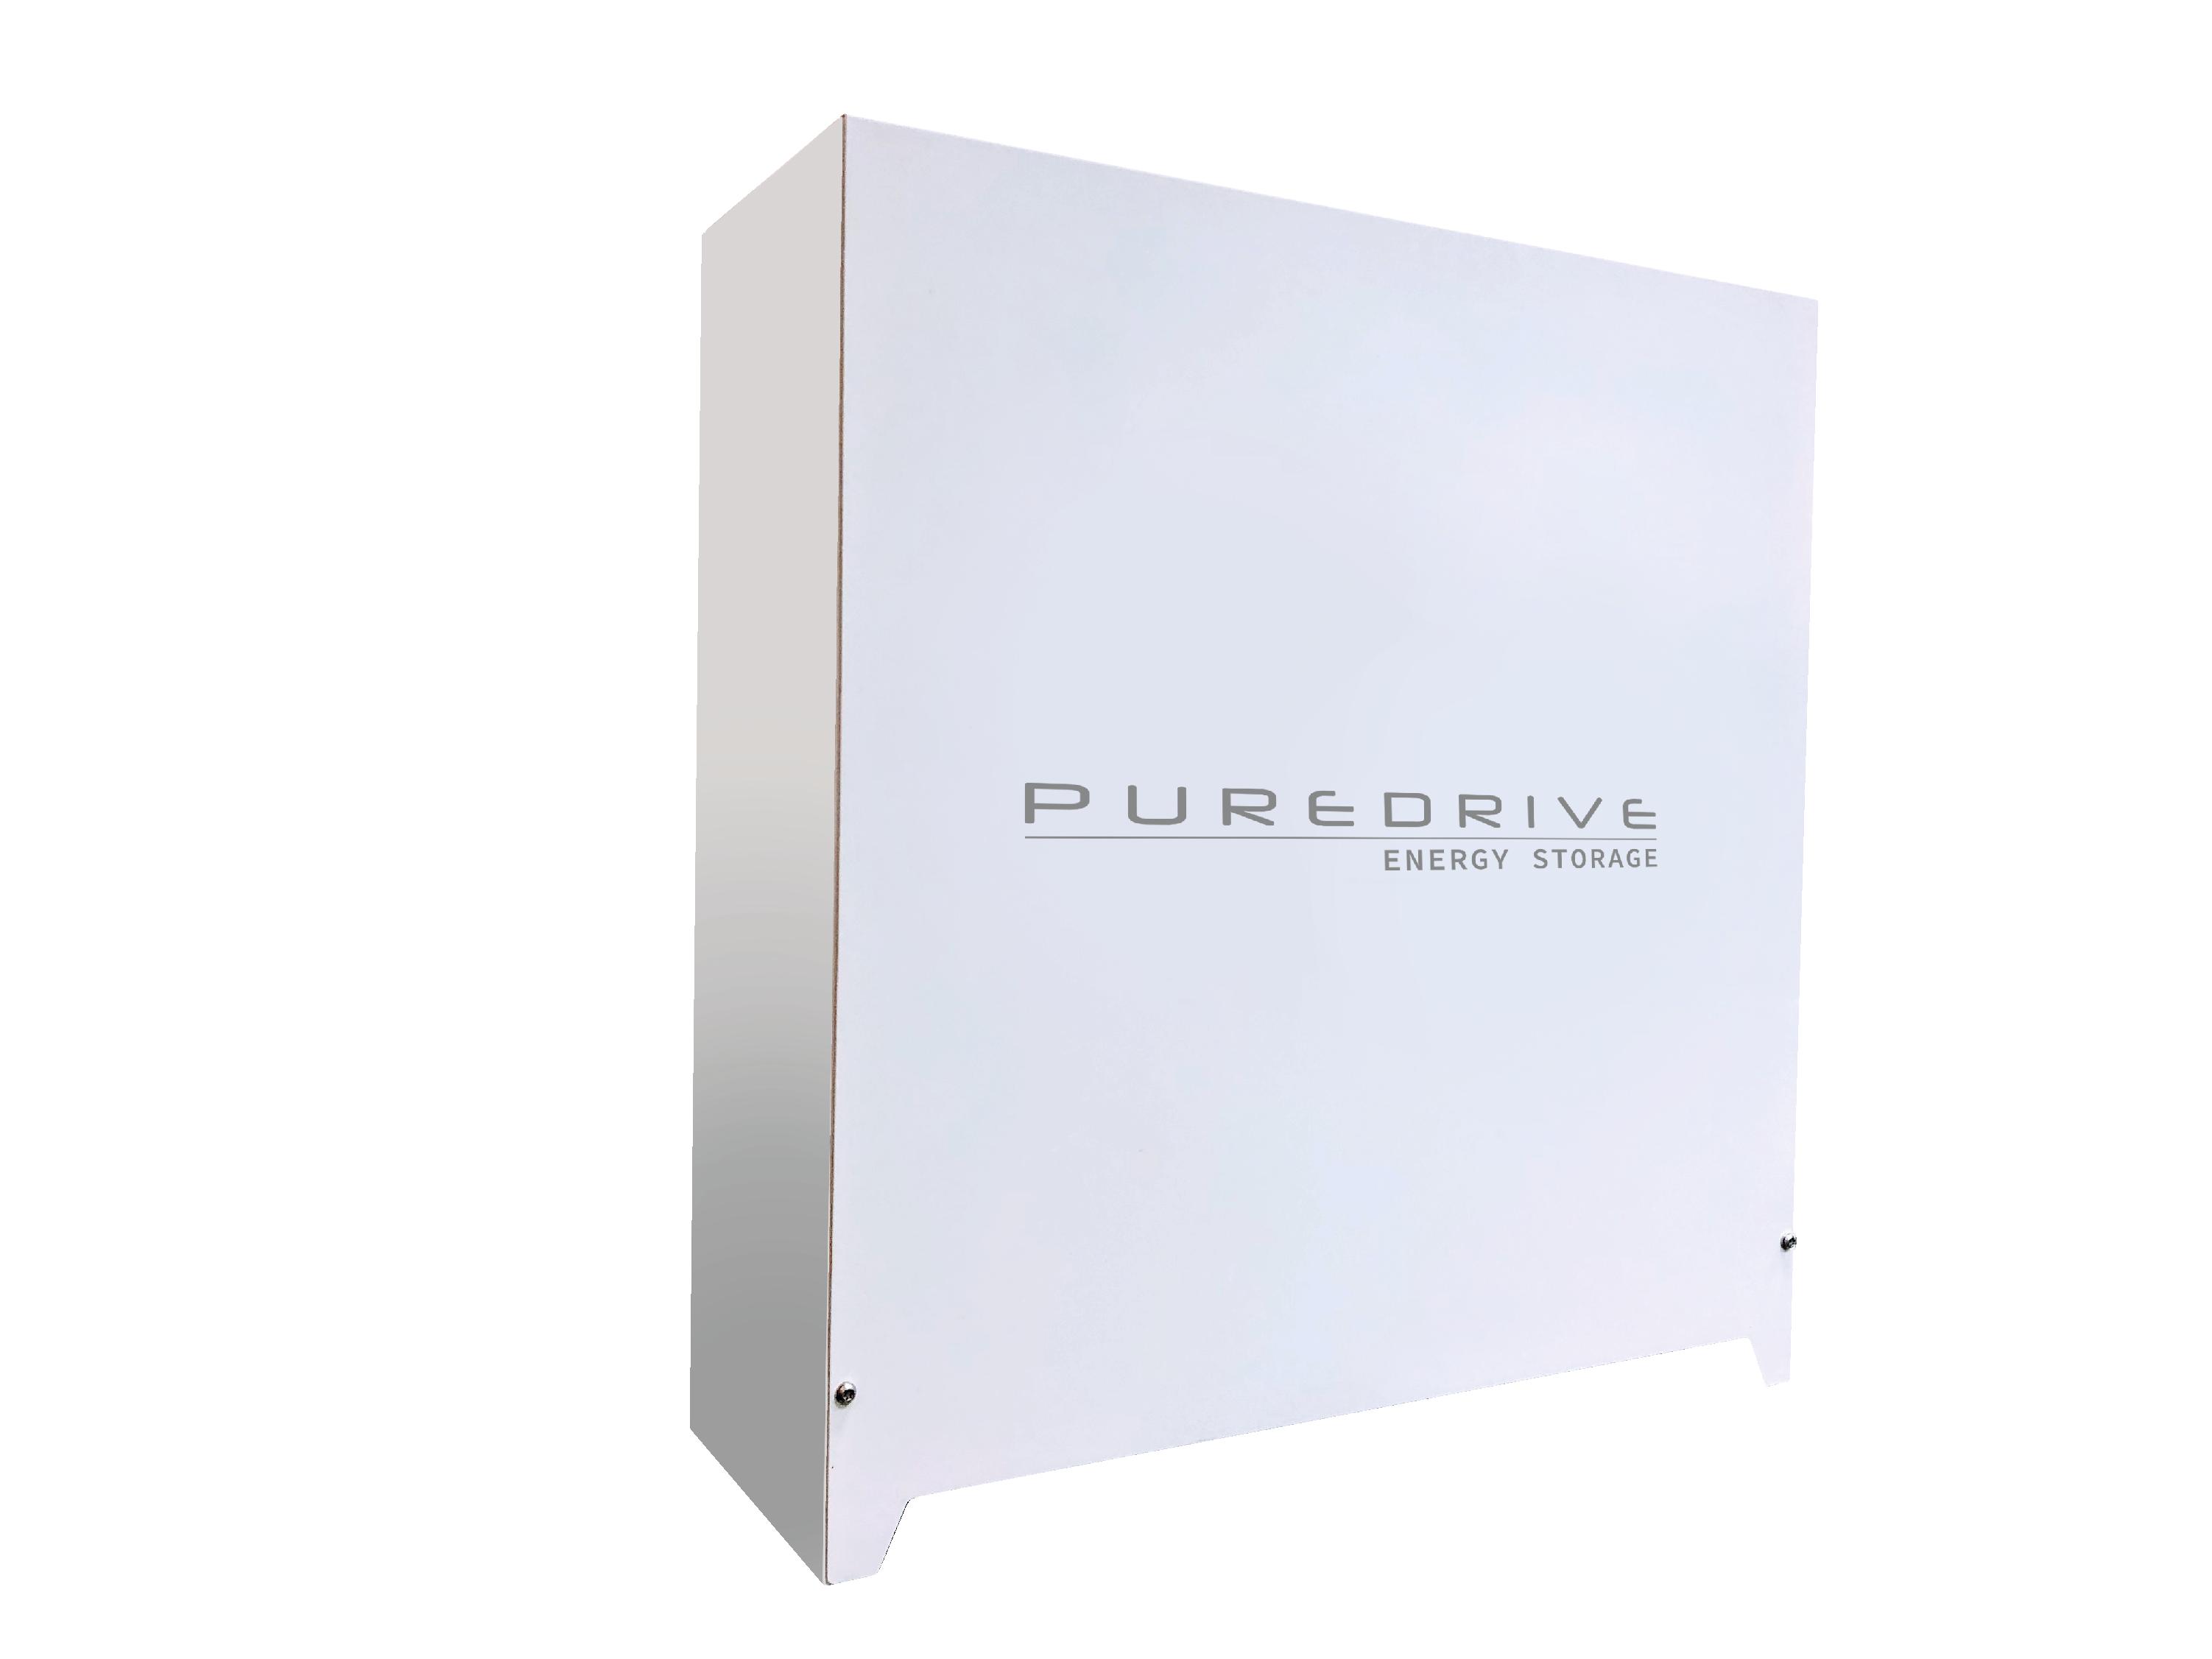 British Smart Battery System Manufacturer Puredrive Energy